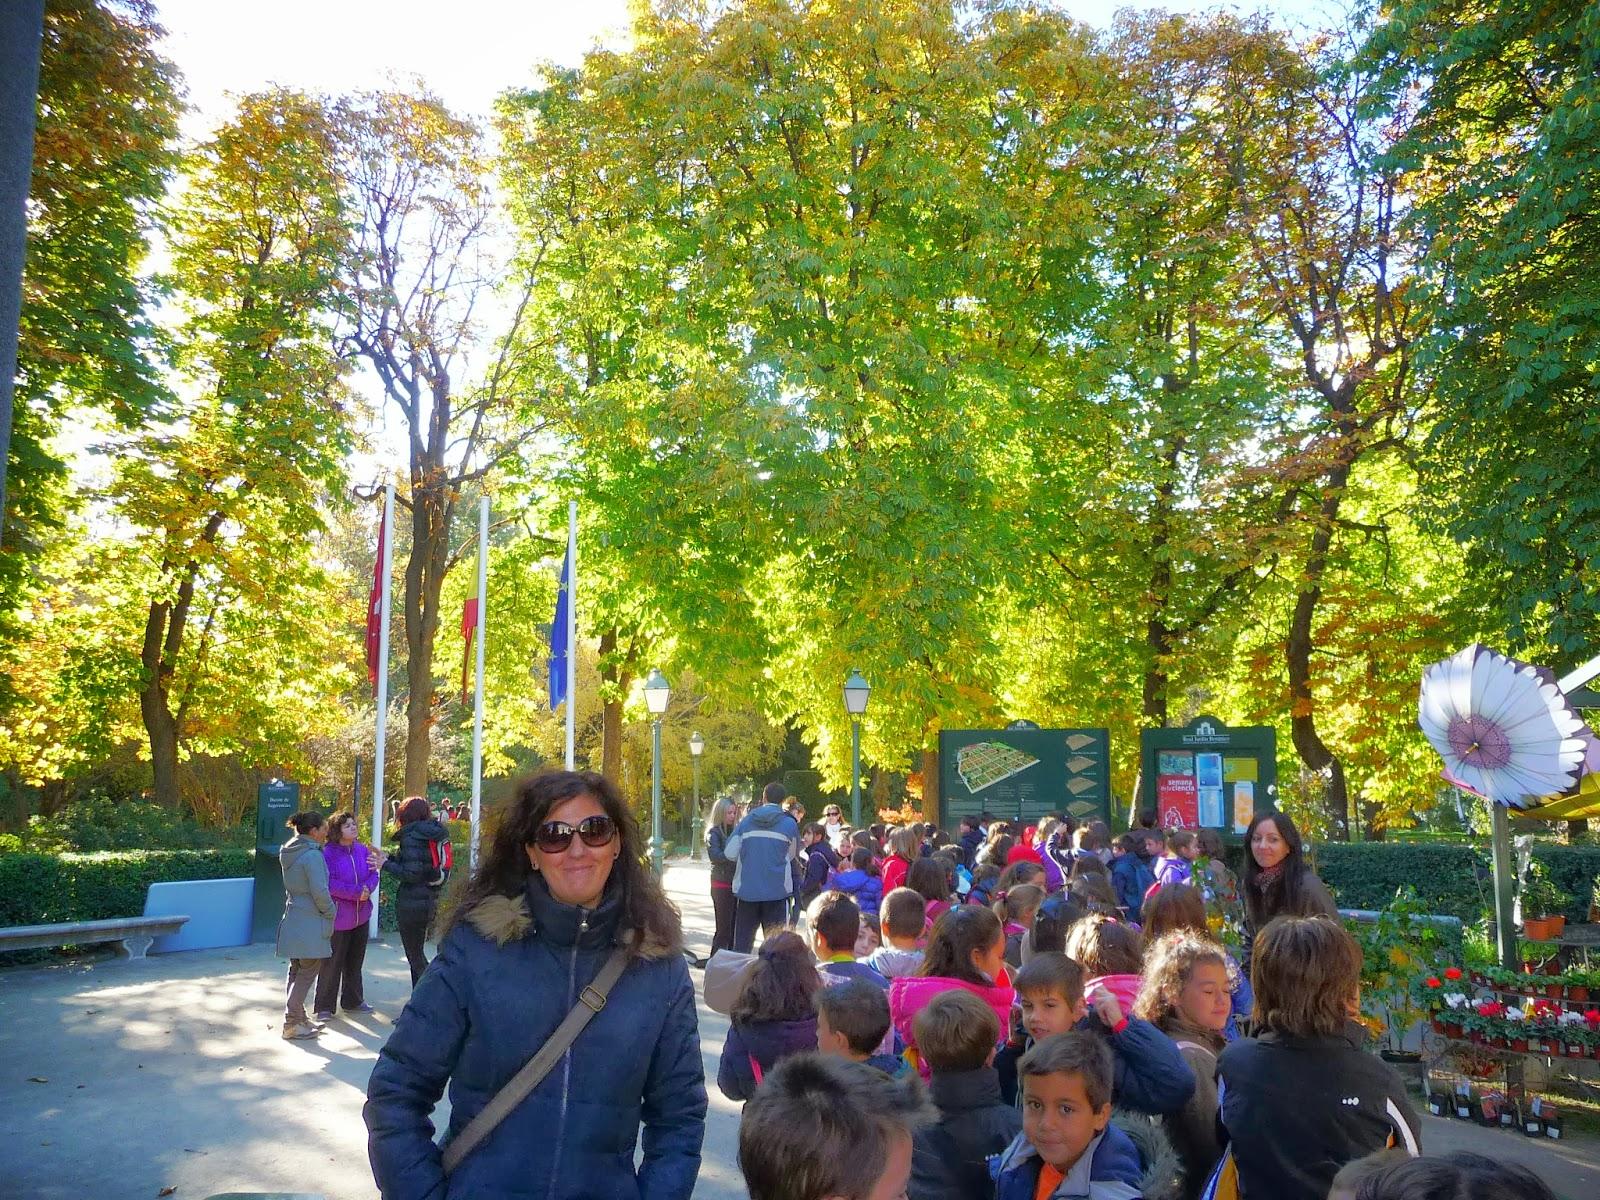 Blog ceip p a de alarc n una ma ana en el jard n for Ceip jardin botanico